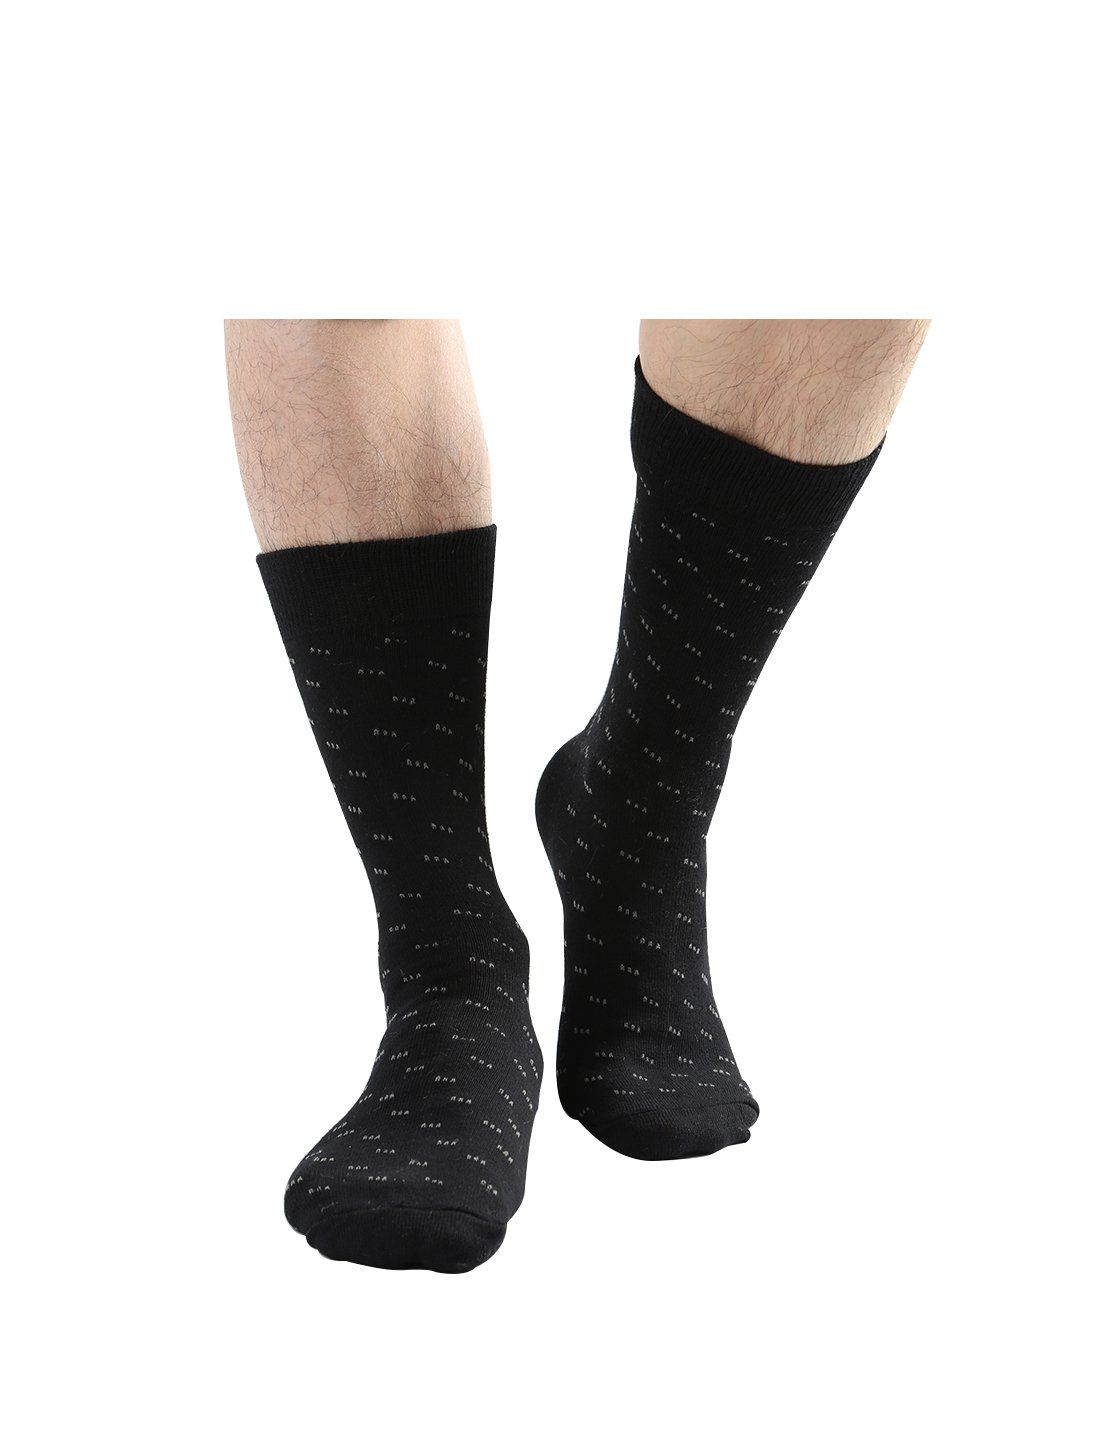 Uxcell Men 10 Packs Luxury Cotton Pattern Long Dress Ribbed Assorted Socks Color Black Stripes 2 Dots Size 1315 Find Black Dress Socks Socks Warm Socks [ 1447 x 1100 Pixel ]